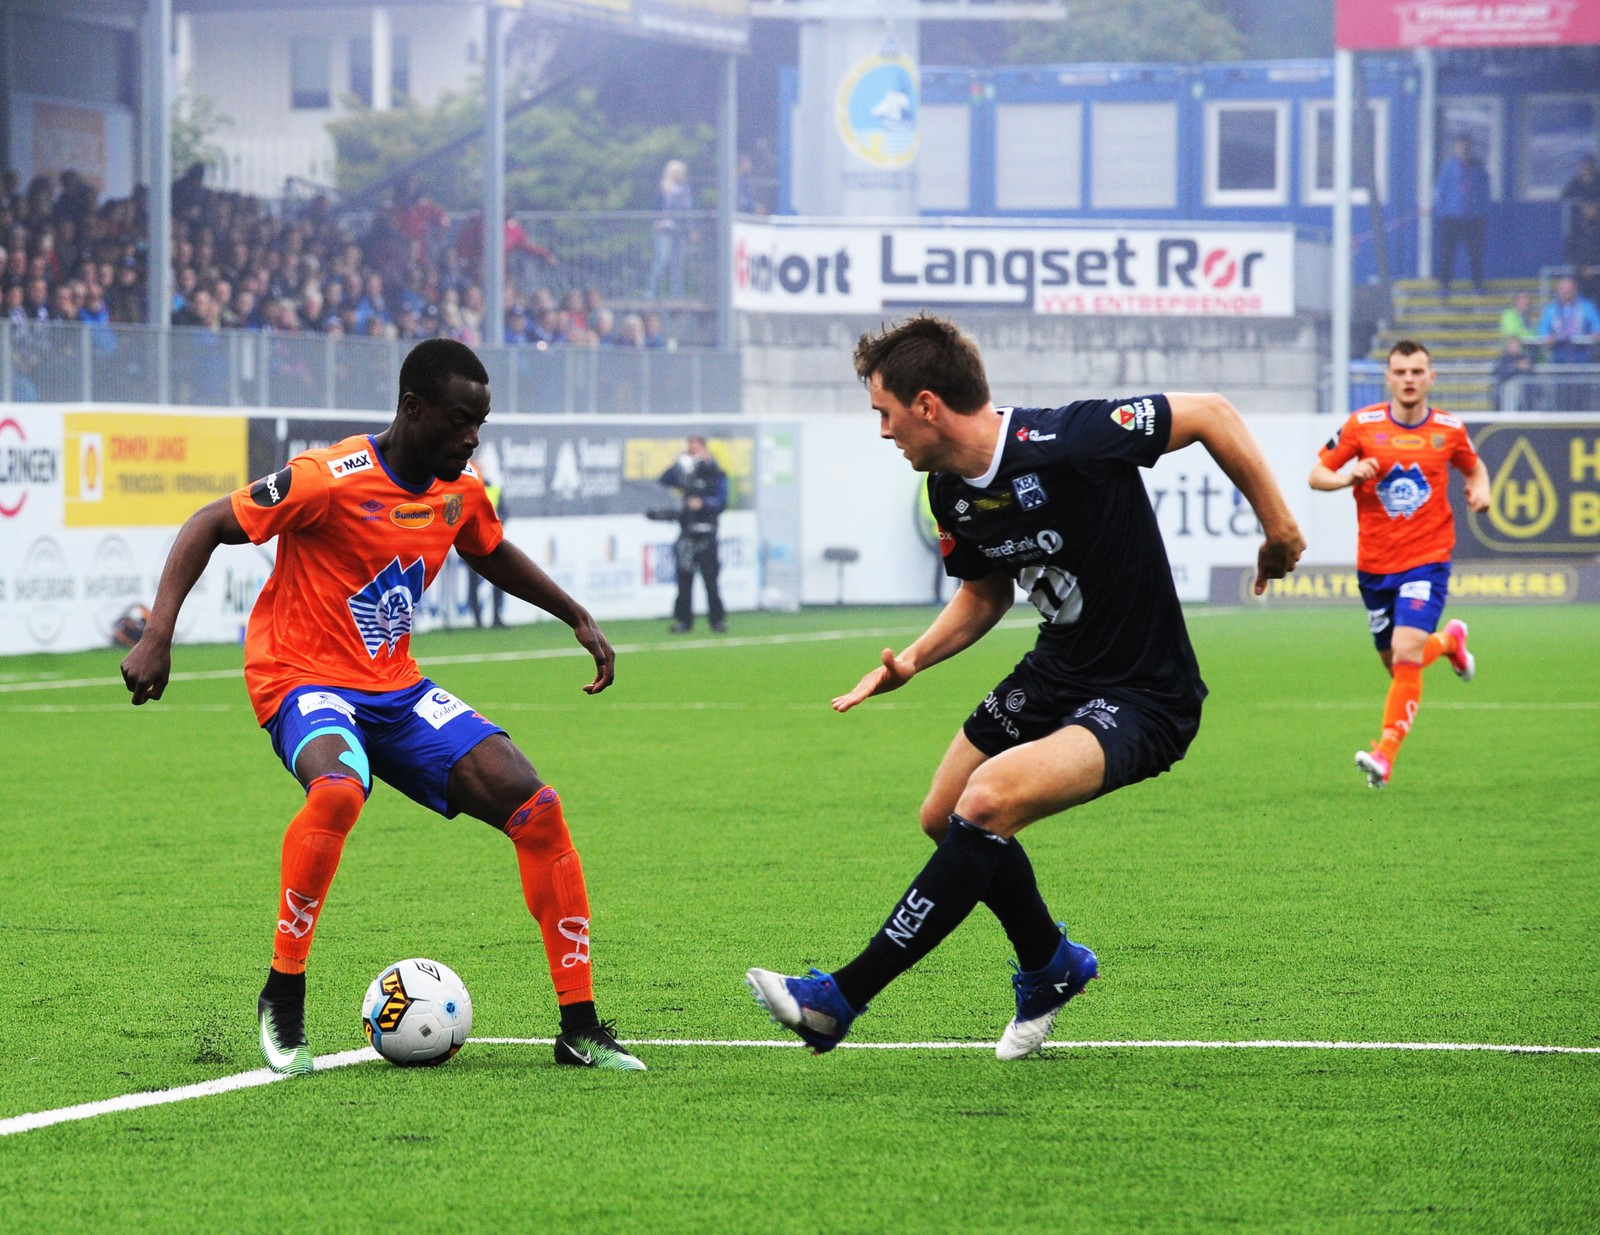 Eliteserien fotball 2017 Kristiansund-Aalesund. Kristiansund 20170617. Eliteserien fotball 2017 Kristiansund-Aalesund. Kristiansund stadion. Foto: Anders Tøsse / NTB scanpix